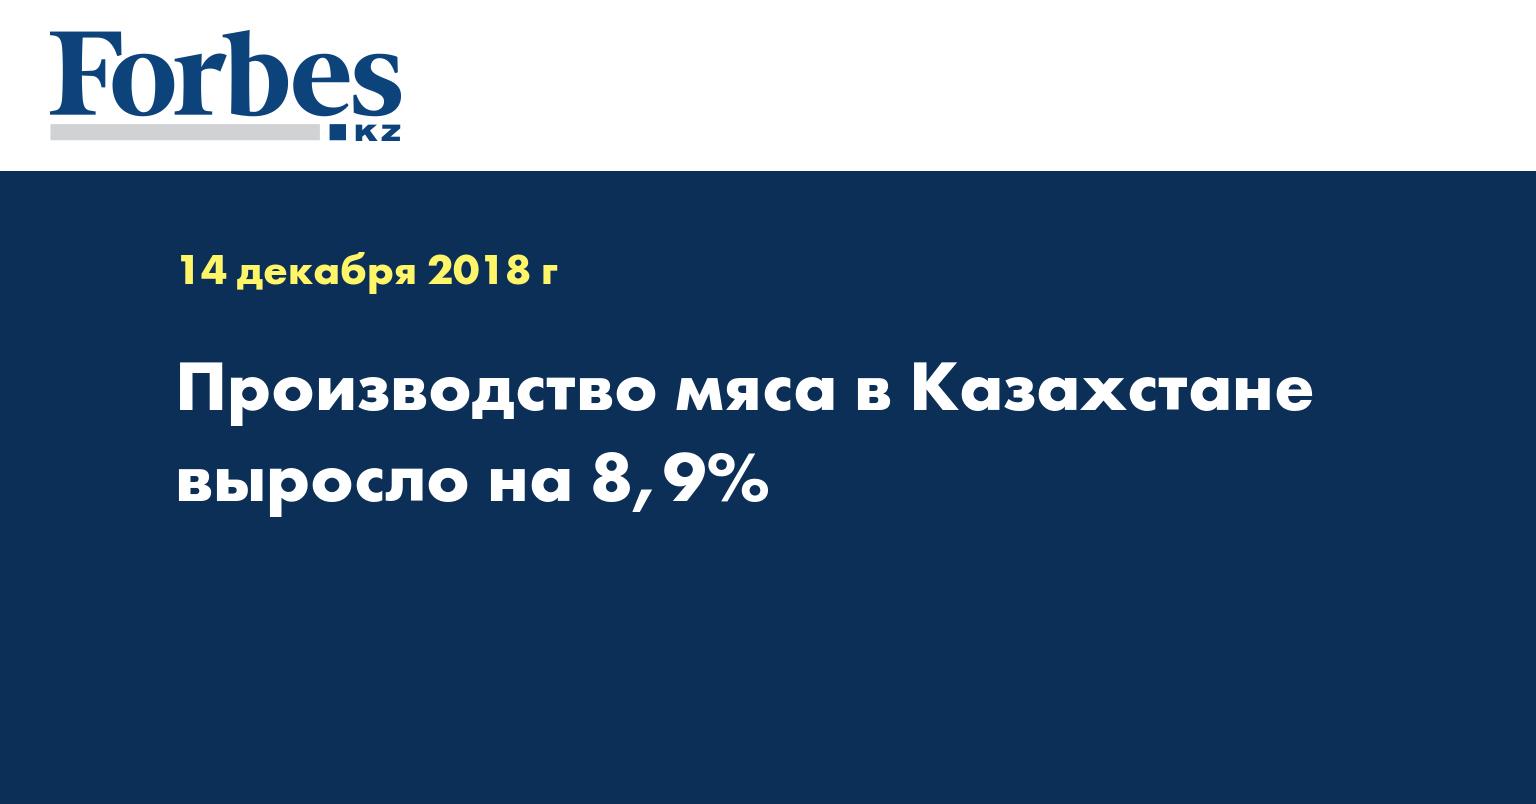 Производство мяса в Казахстане выросло на 8,9%